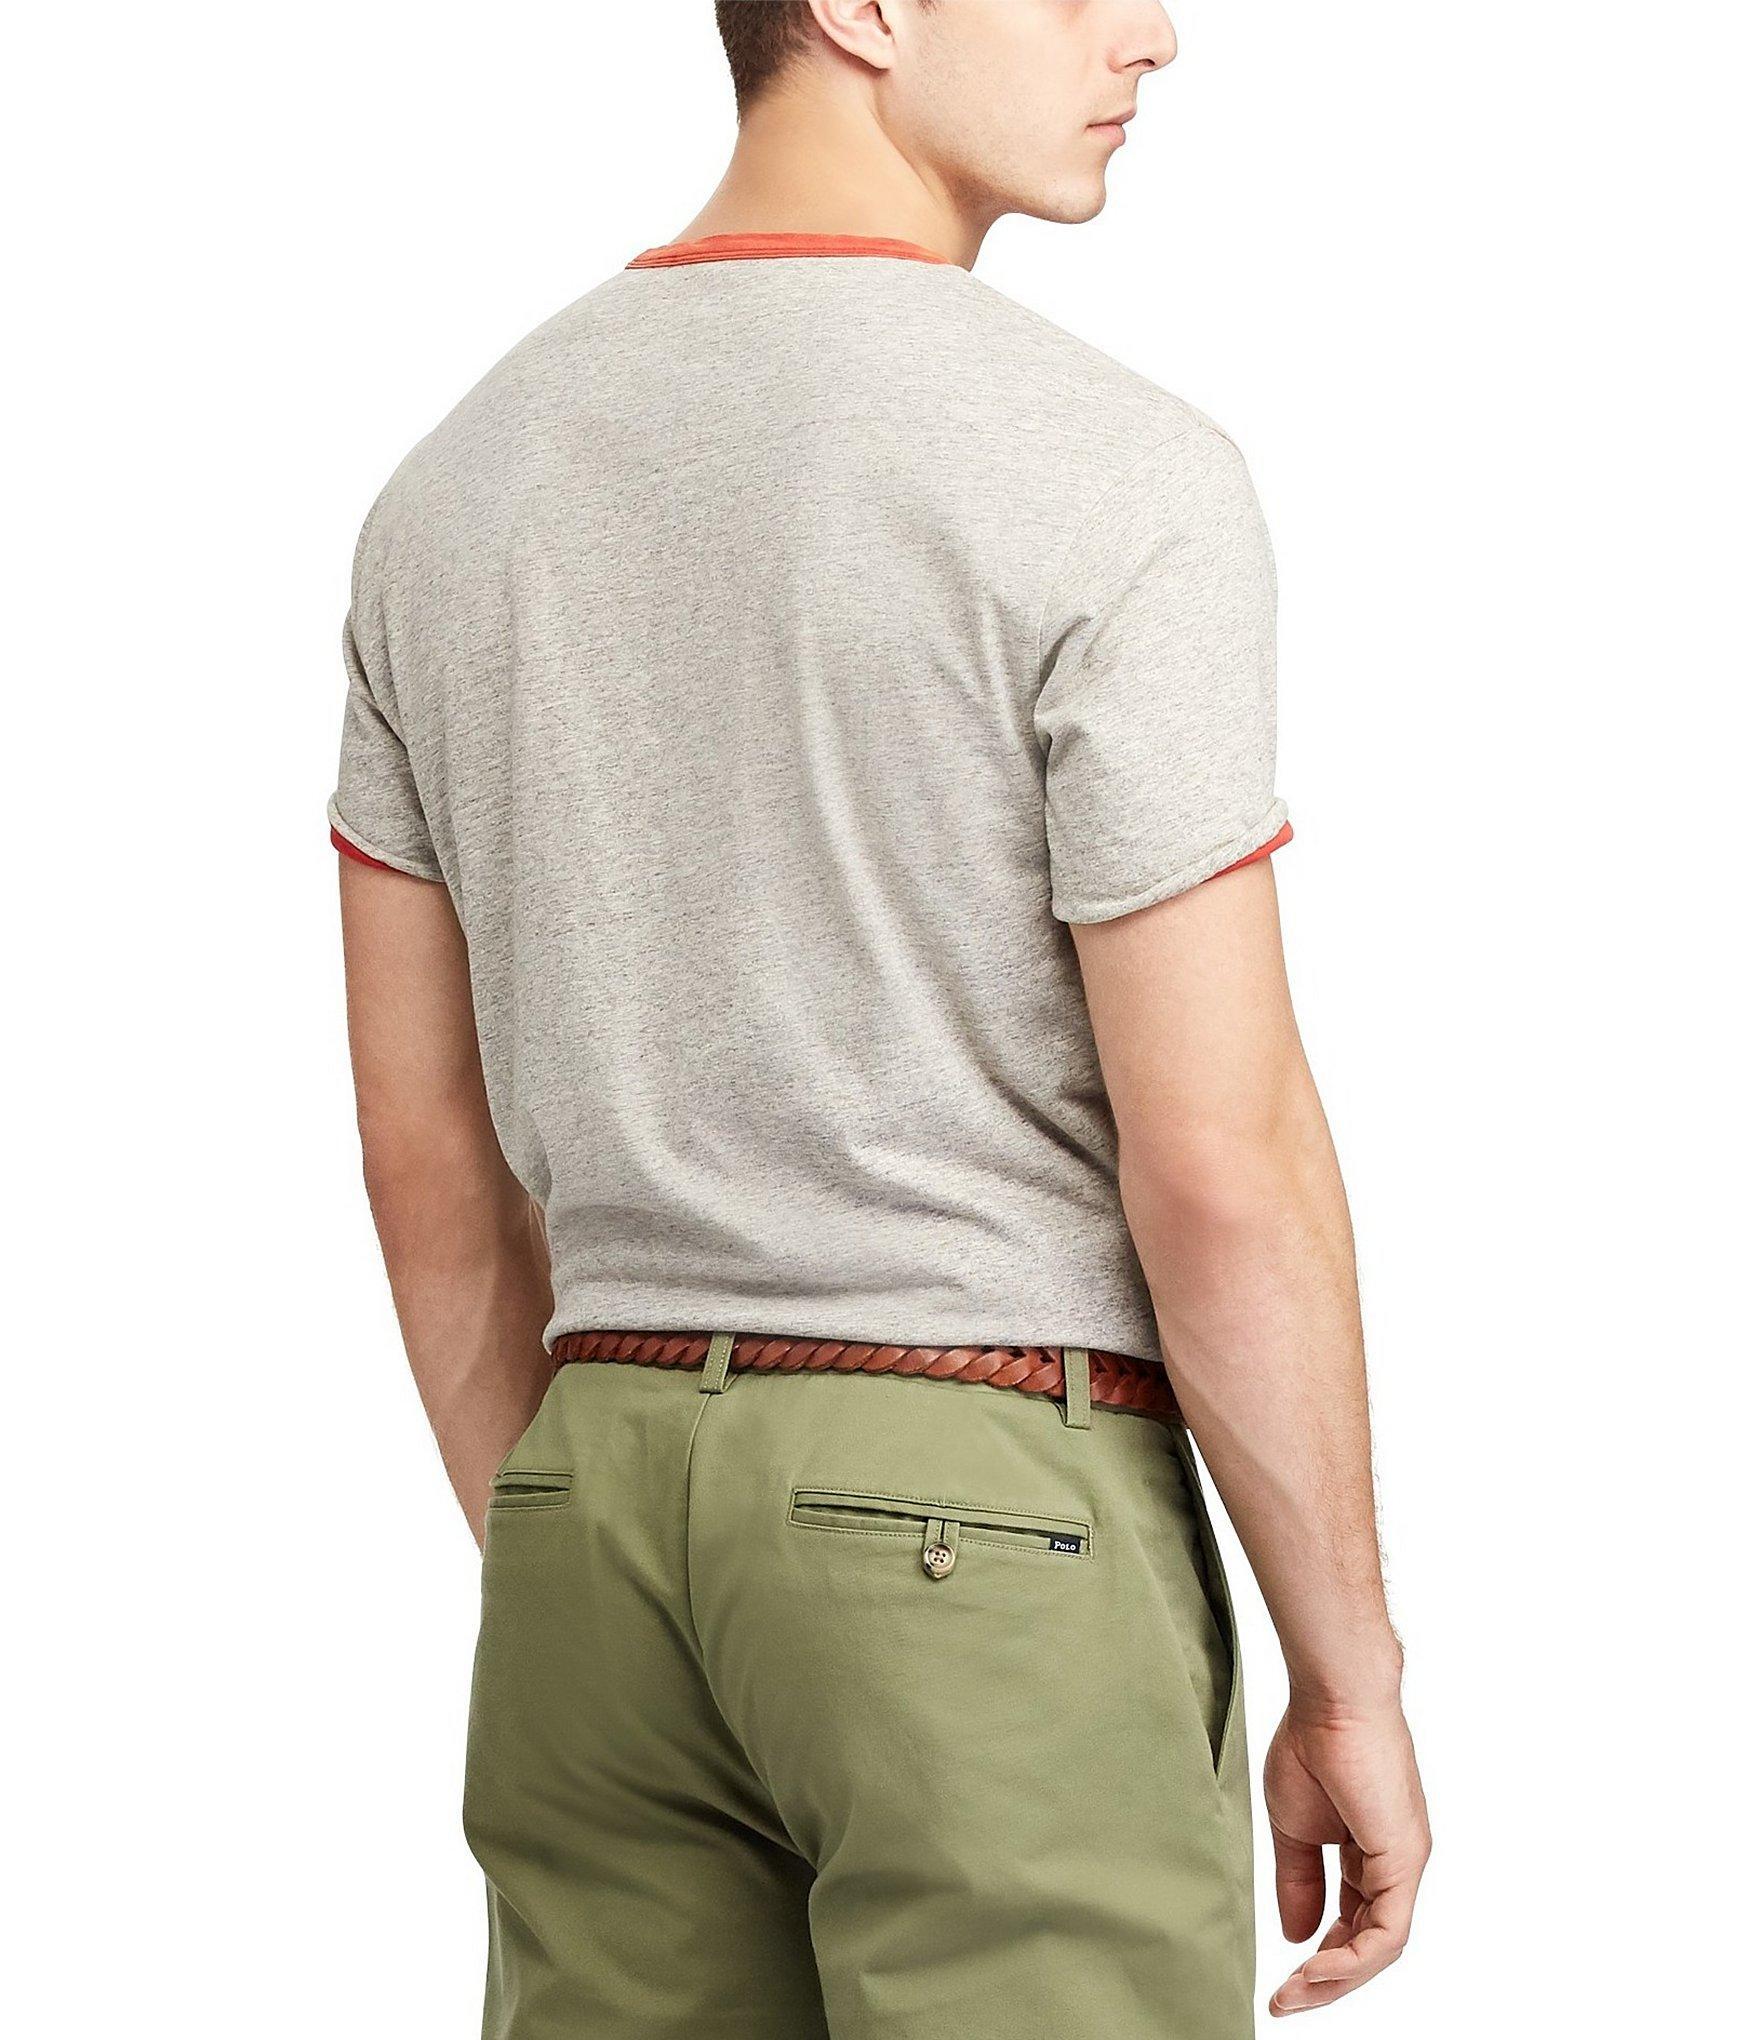 c4d3ba9c2e Polo Ralph Lauren - Multicolor Custom Slim-fit Yale Short-sleeve Reversible Graphic  Tee. View fullscreen